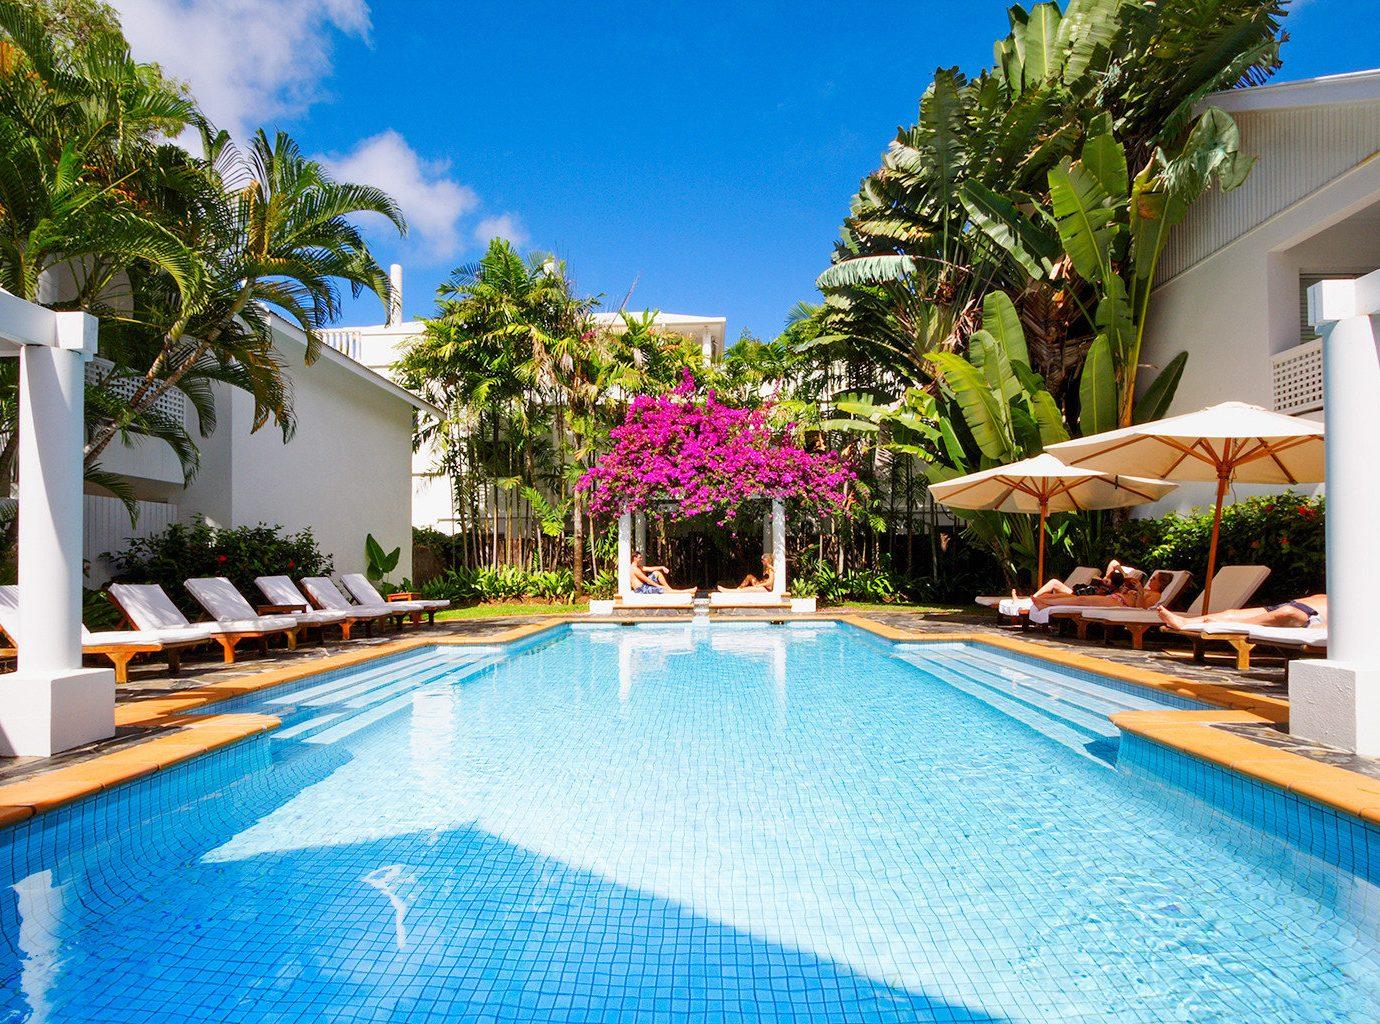 Play Pool Resort Scenic views tree swimming pool building property leisure Villa caribbean condominium resort town mansion backyard swimming